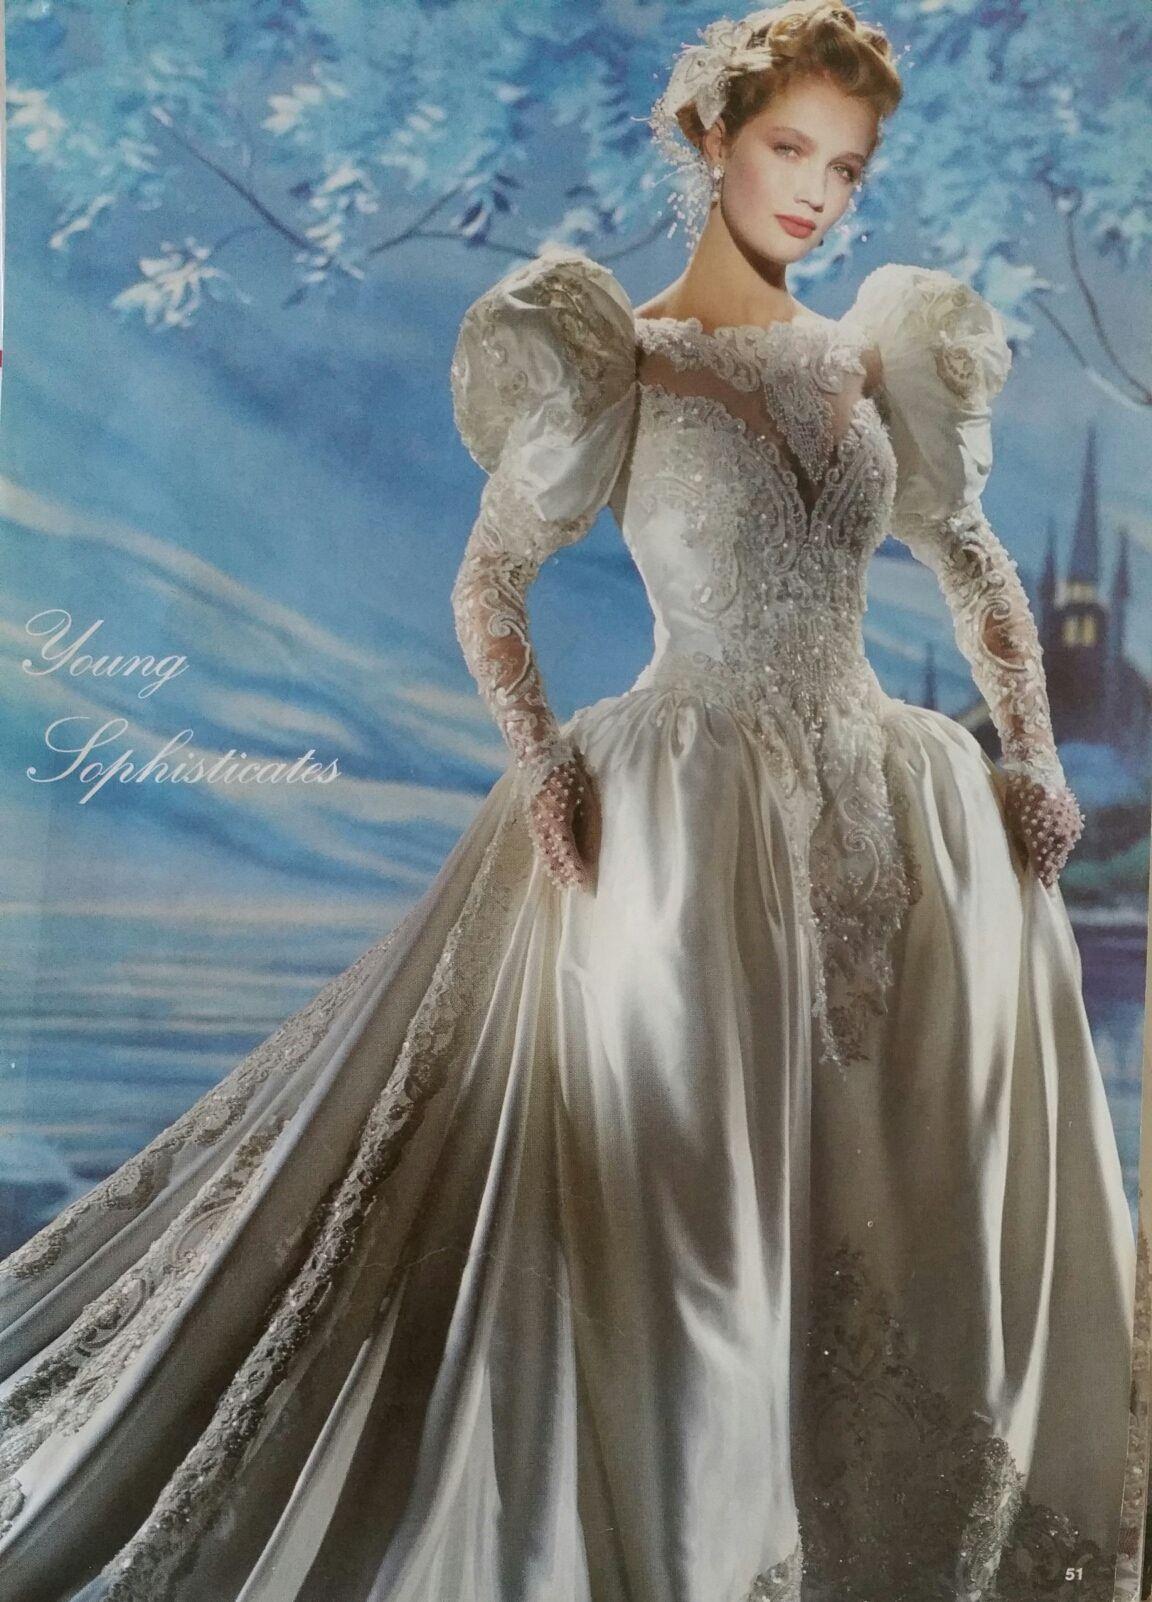 Demitrious Wedding Gowns.Demetrios 1990 1991 Weddings In 2019 Antique Wedding